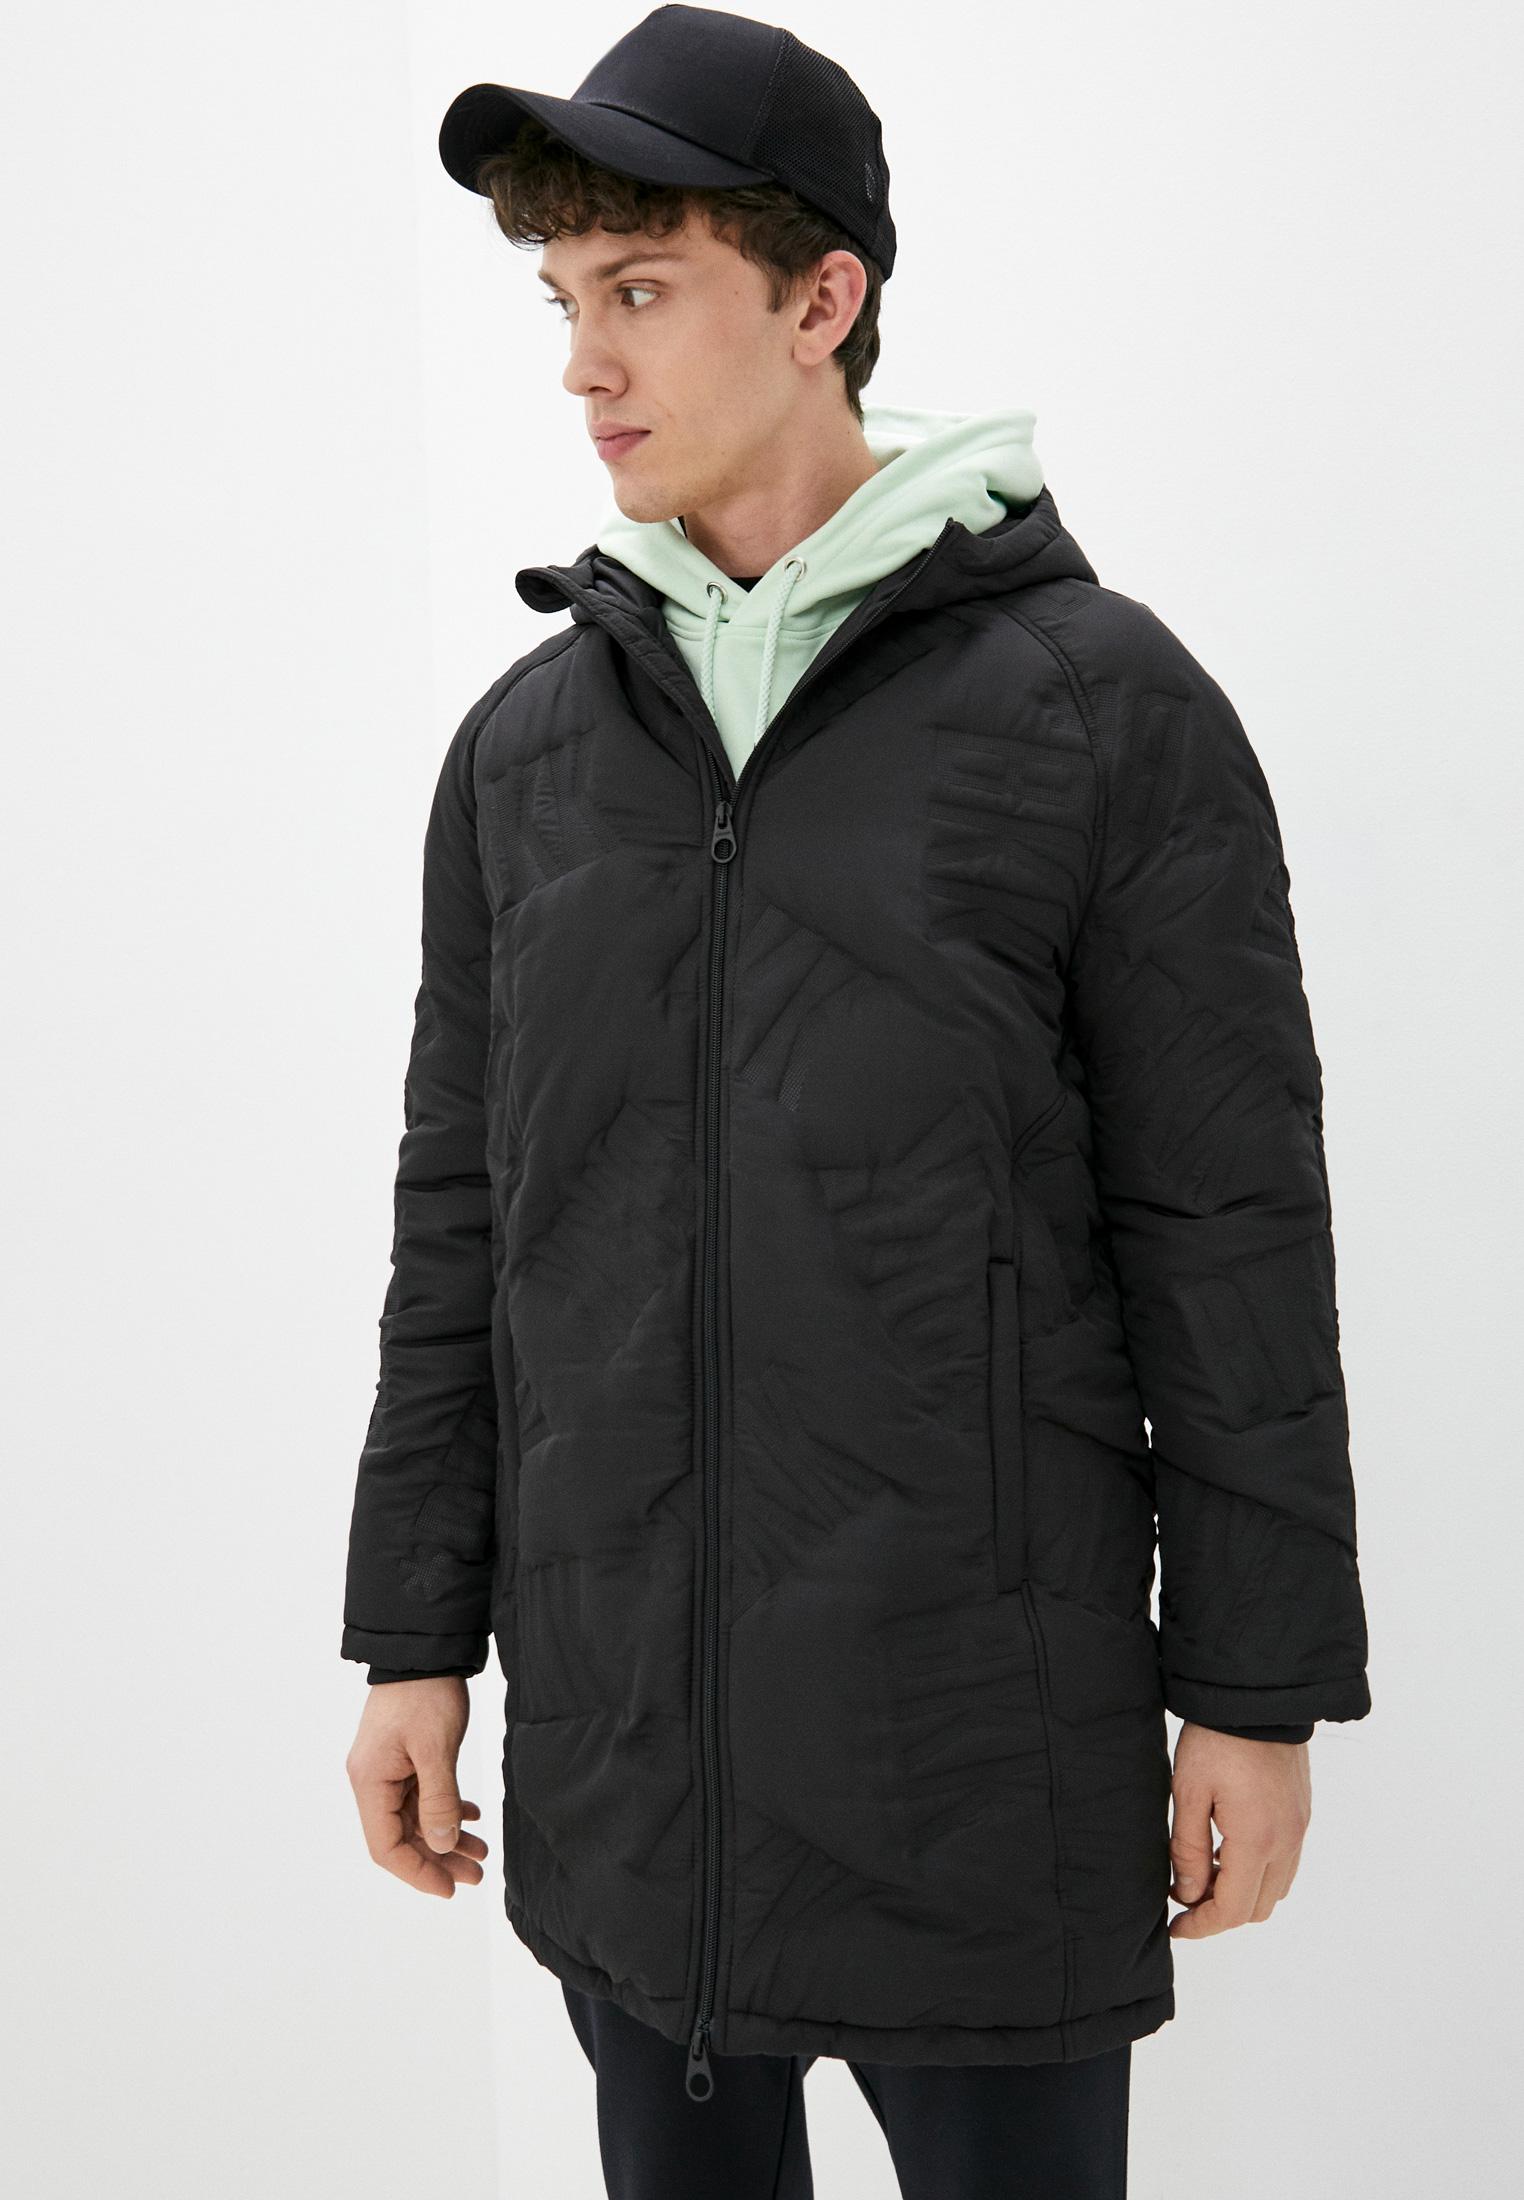 Мужская куртка Bikkembergs (Биккембергс) C J 044 00 J 0180